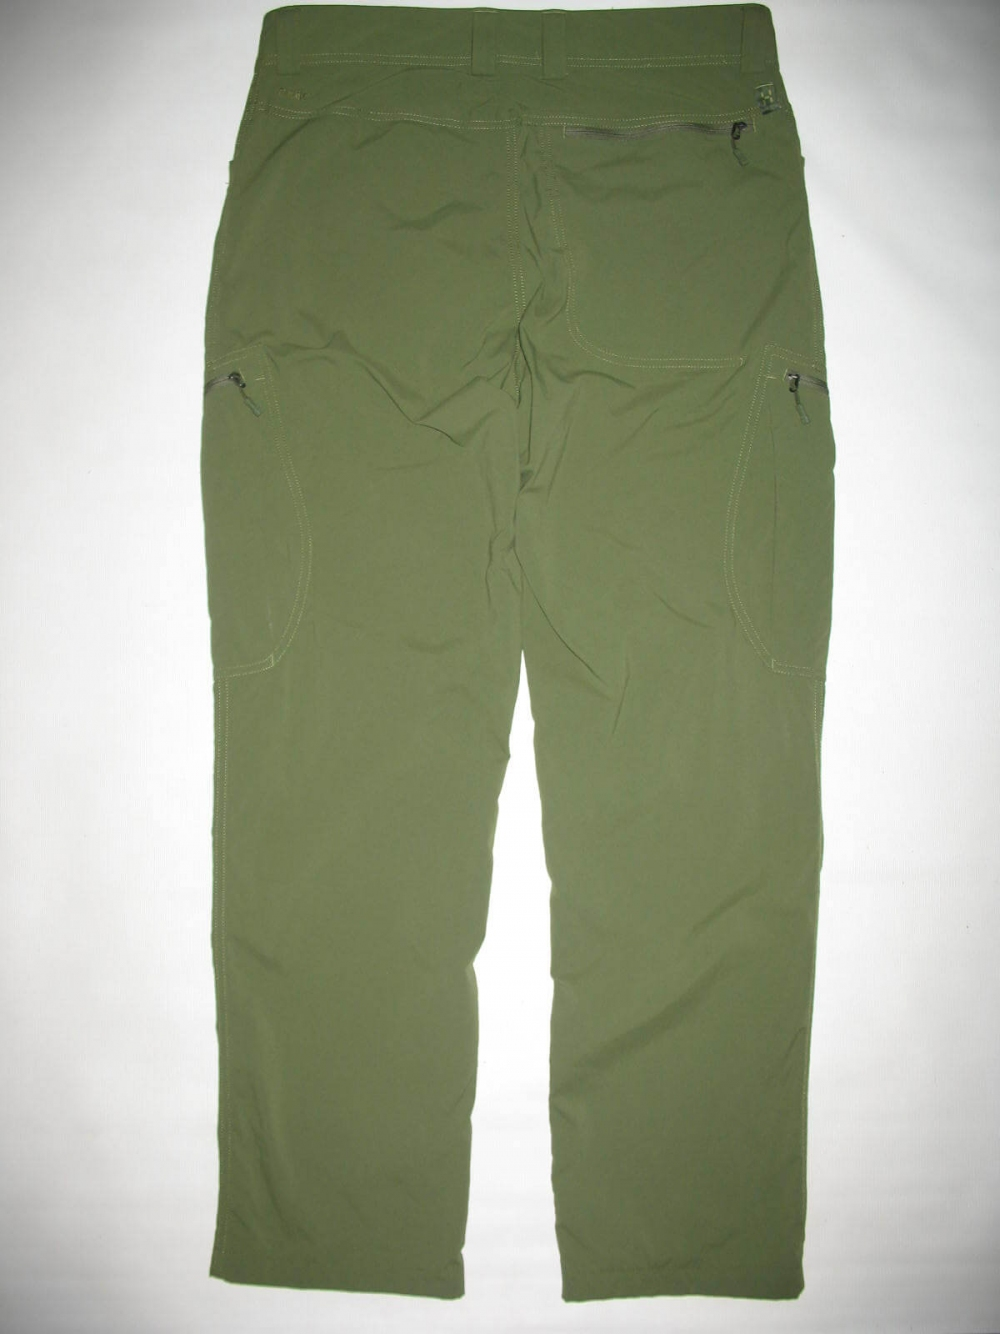 Штаны HAGLOFS mid fjell climatic pants (размер L/XL) - 4